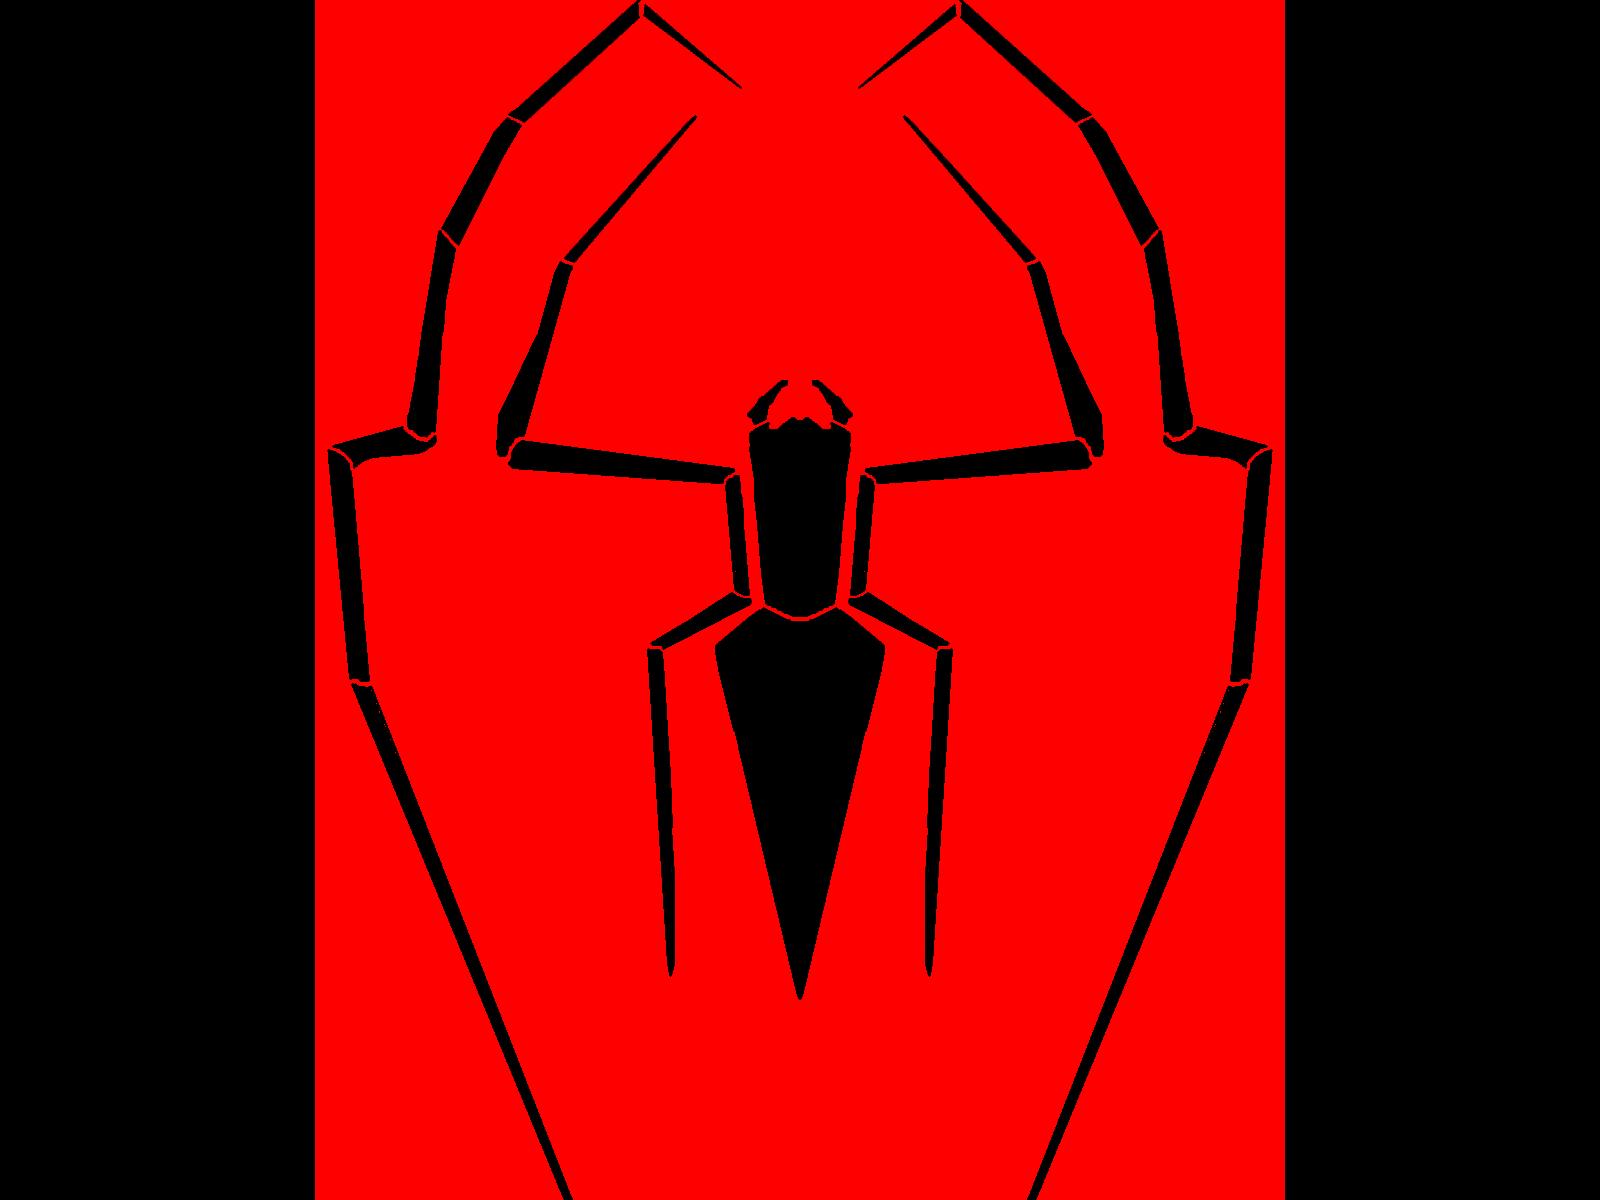 Spider-Man Alethi glyph